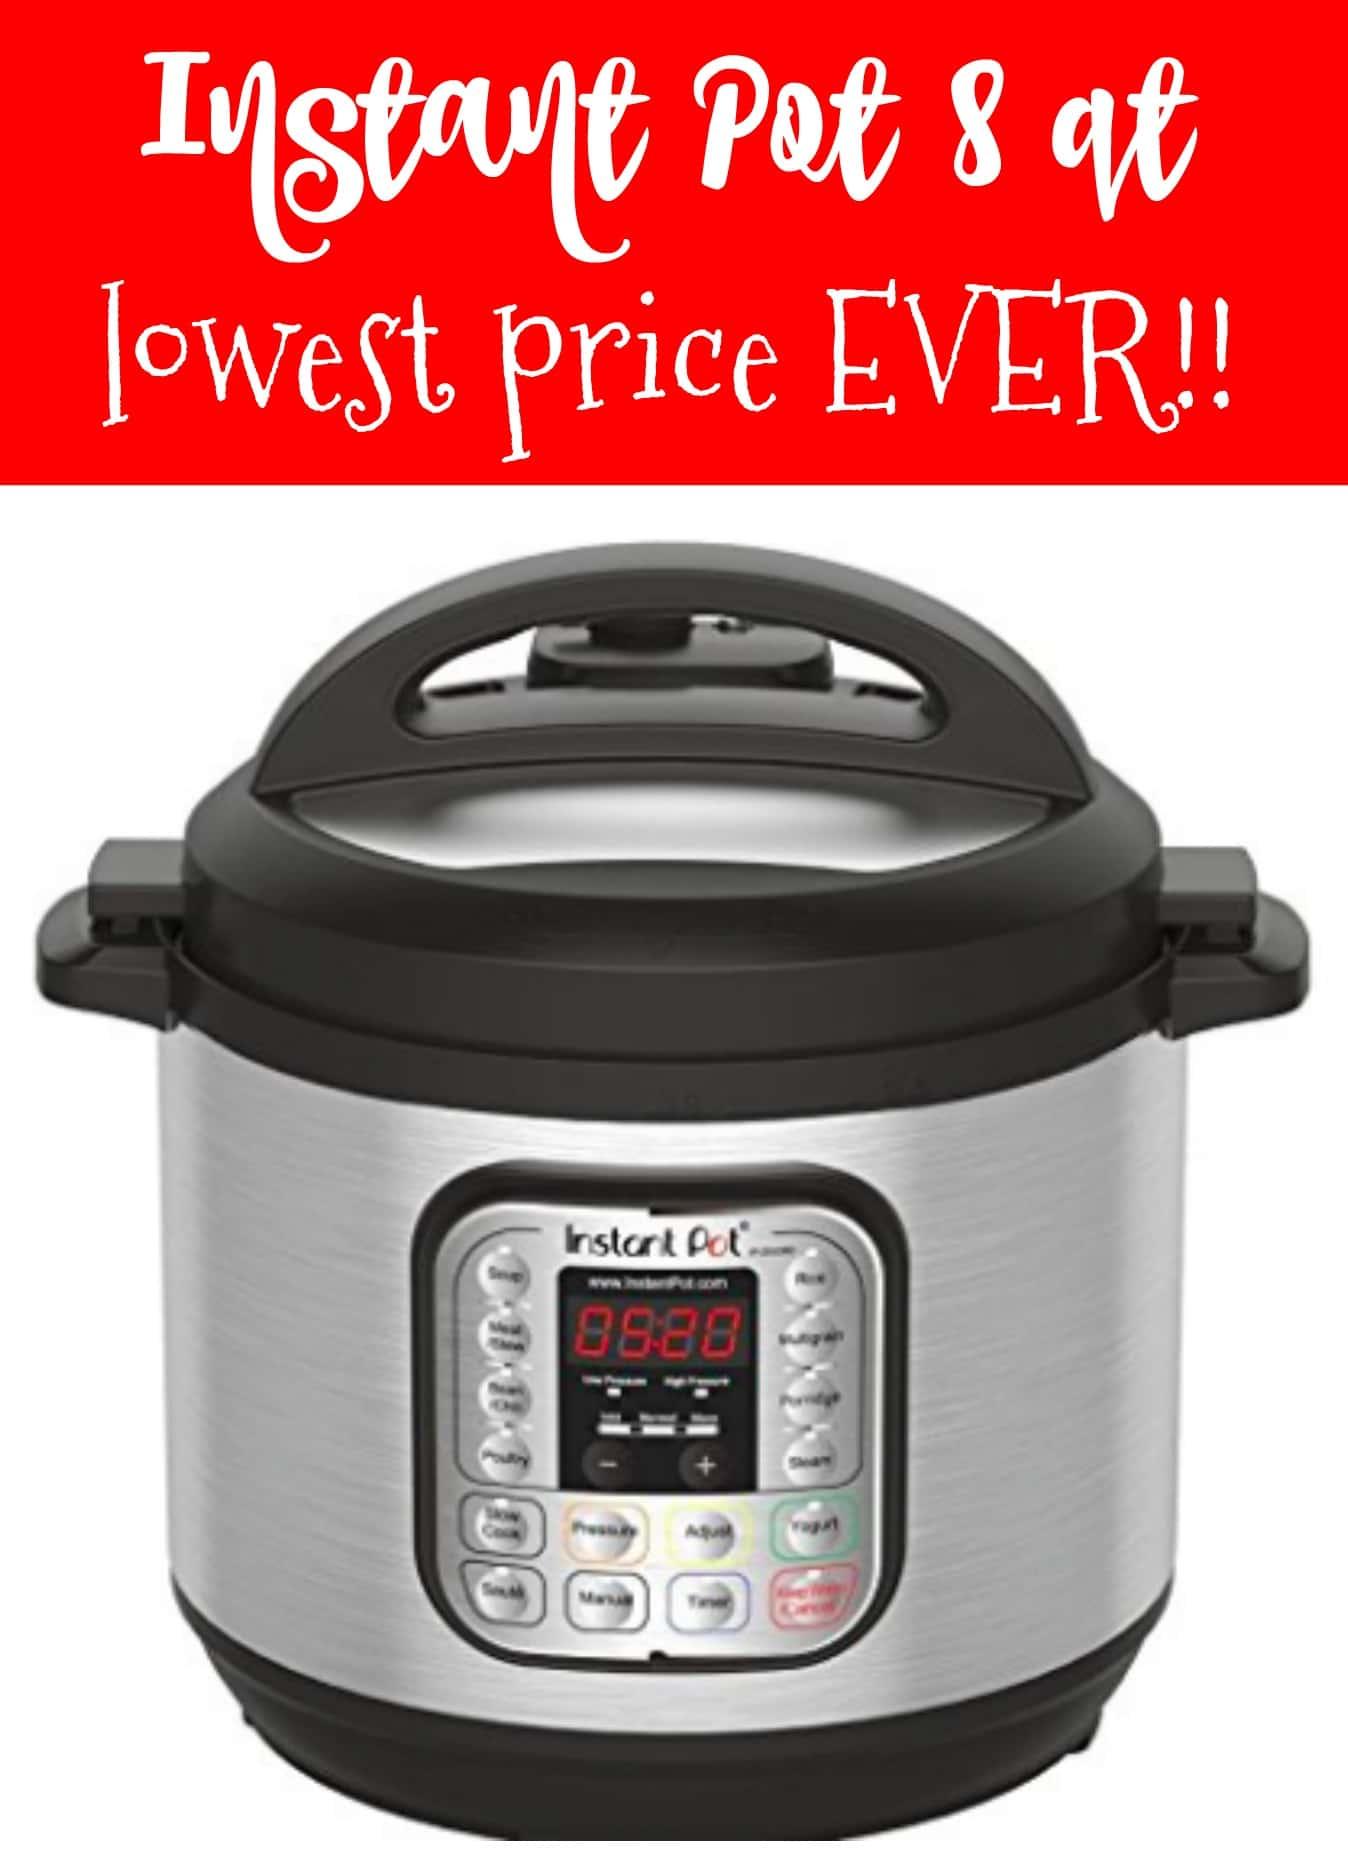 Black Bean Pressure Cooker Instant Pot 8 Qt 7-in-1 LOWEST PRICE EVER! - Kasey Trenum